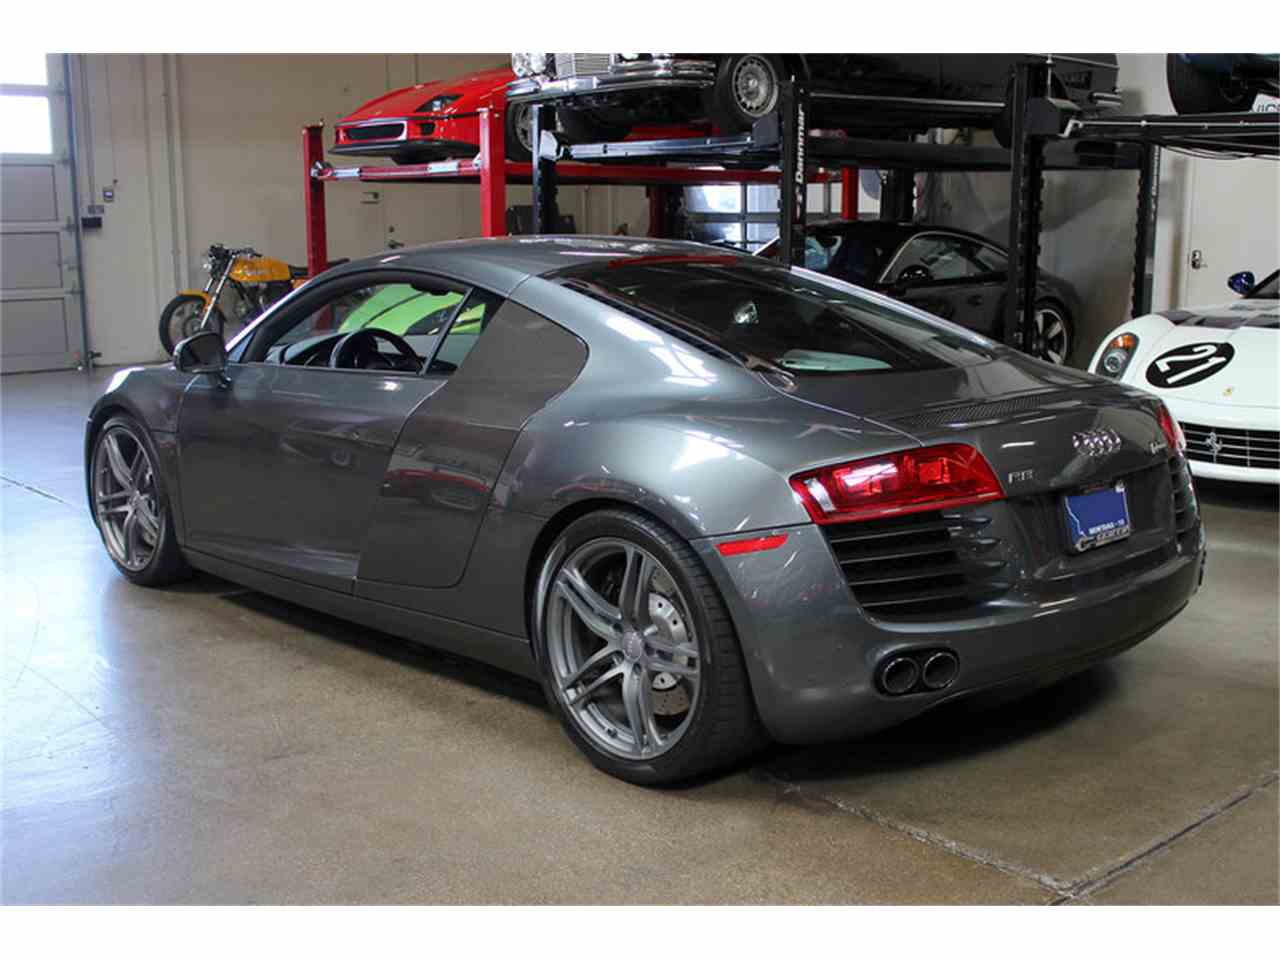 Large Picture of 2012 Audi R8 located in California - $95,995.00 - LSDM